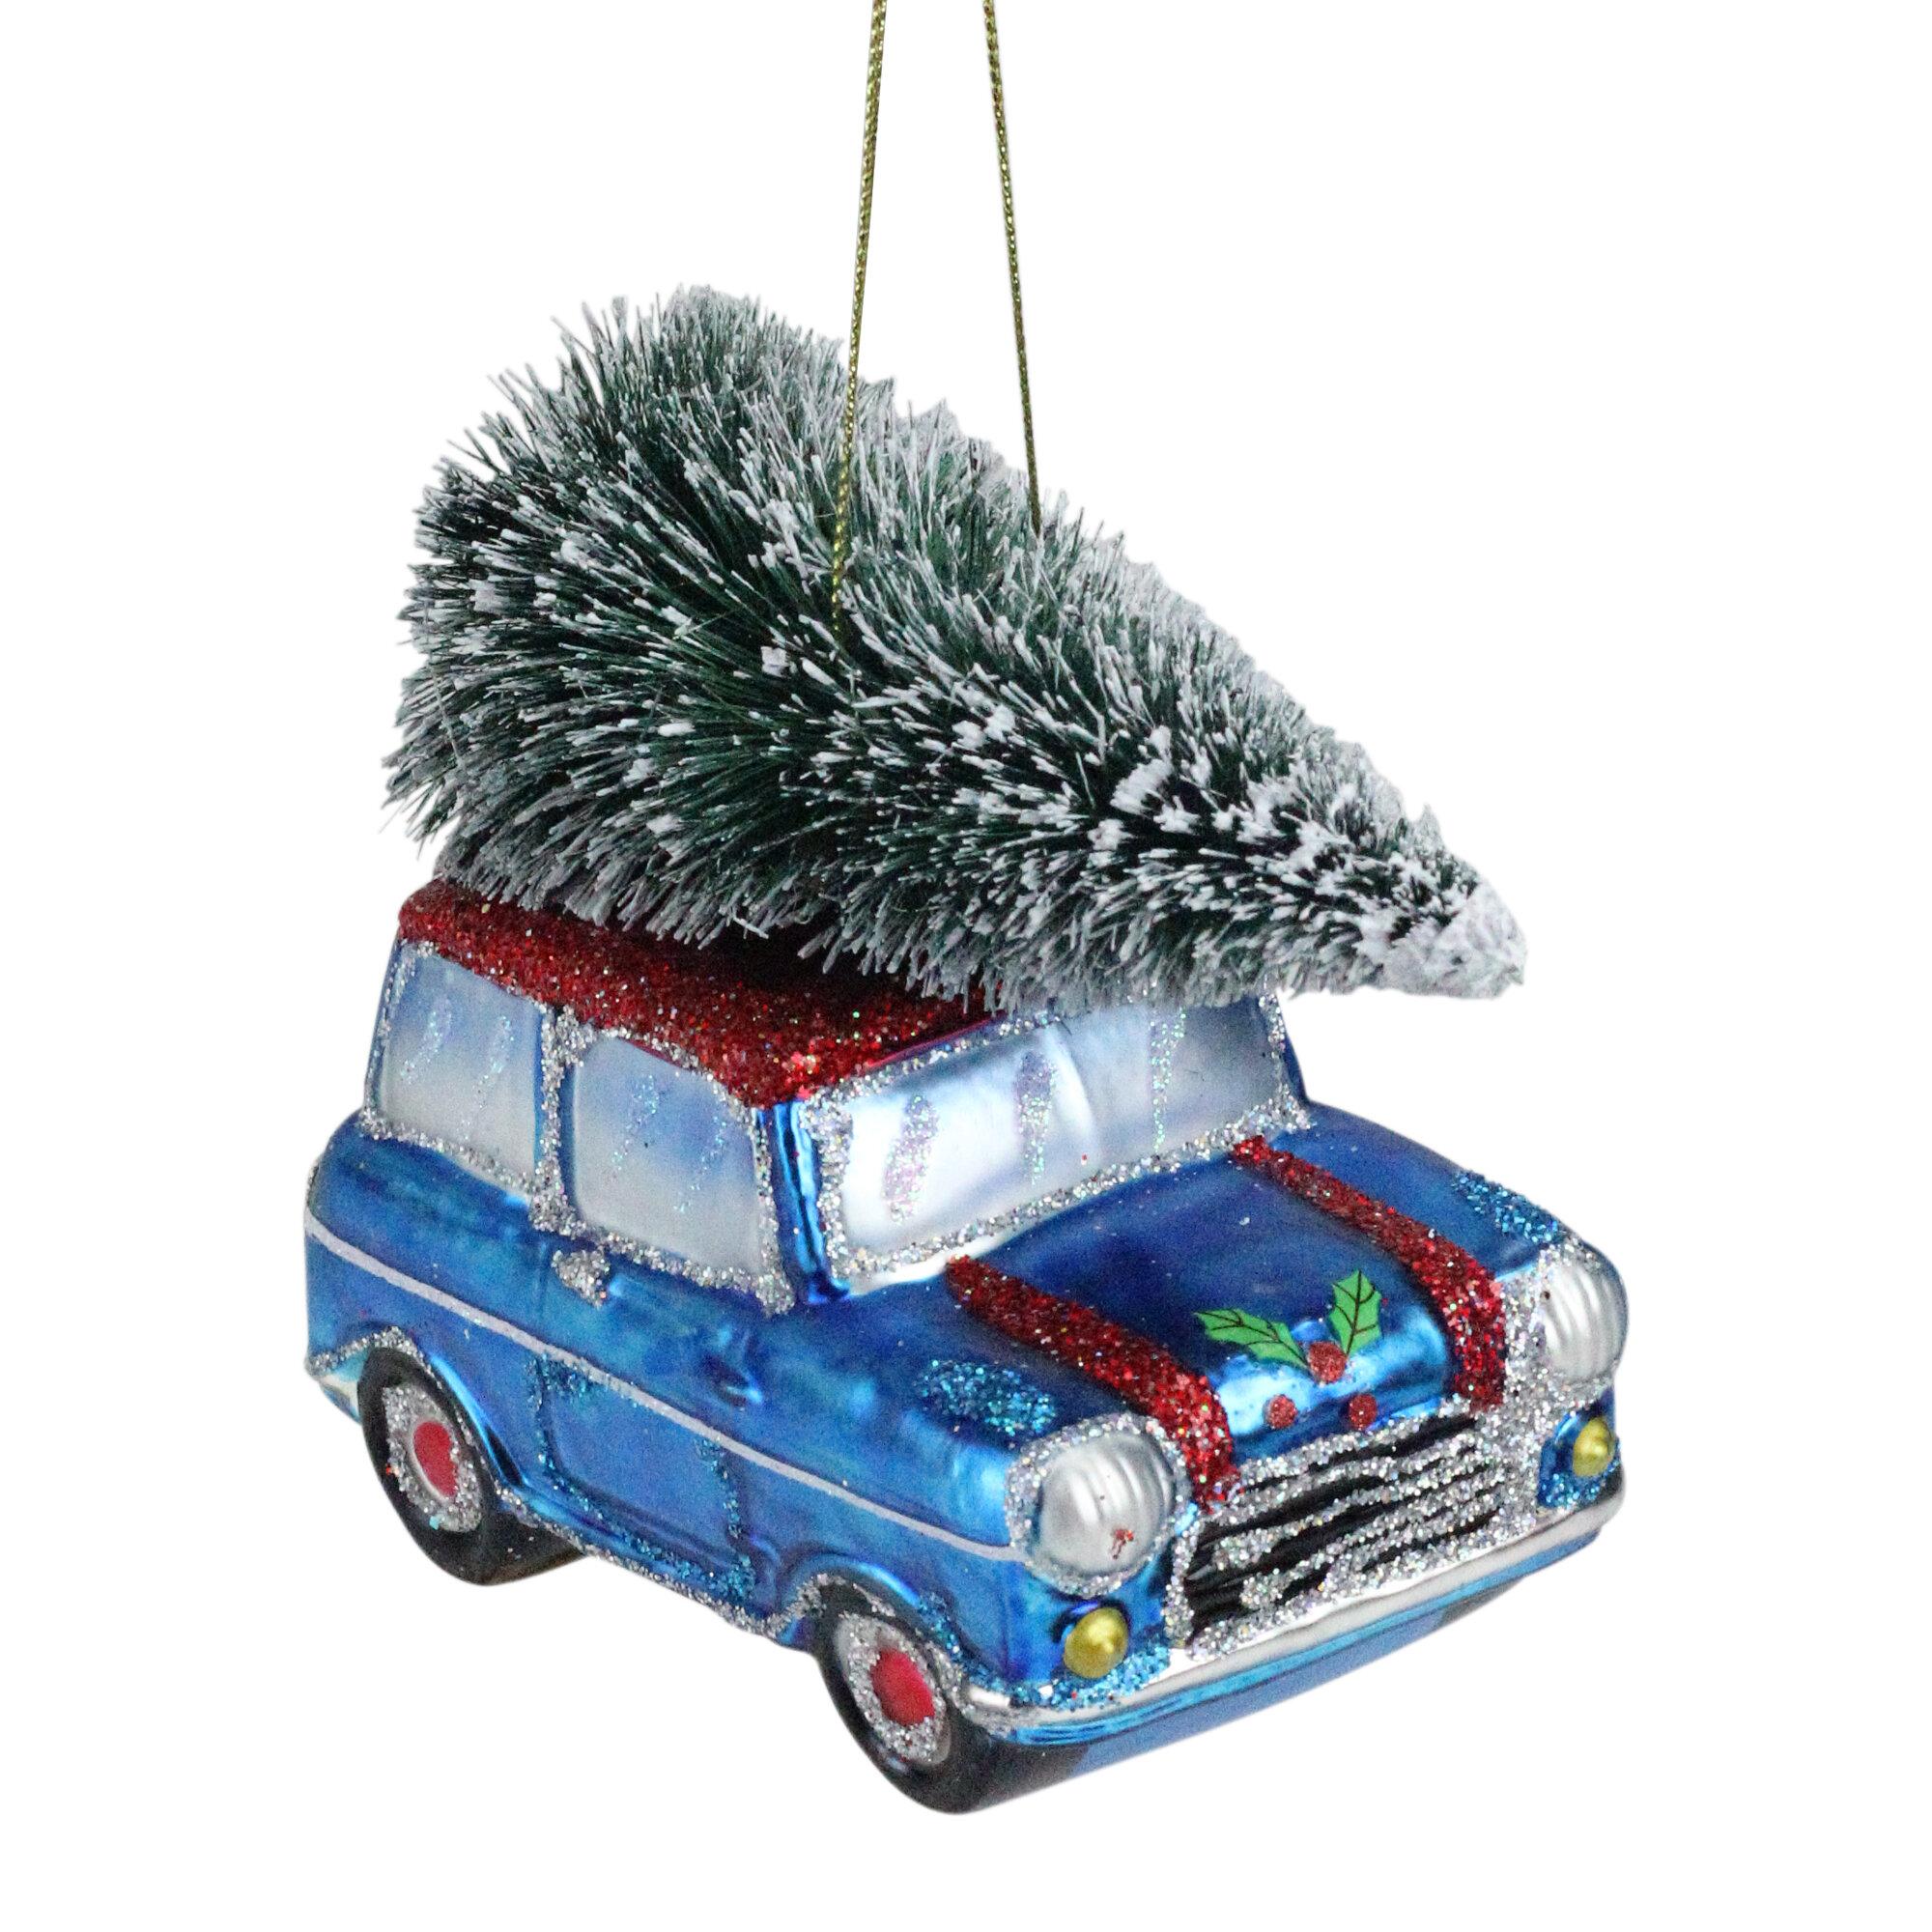 Northlight 4 Blue Glass Station Wagon Hauling Home The Holiday Tree Christmas Ornament Wayfair